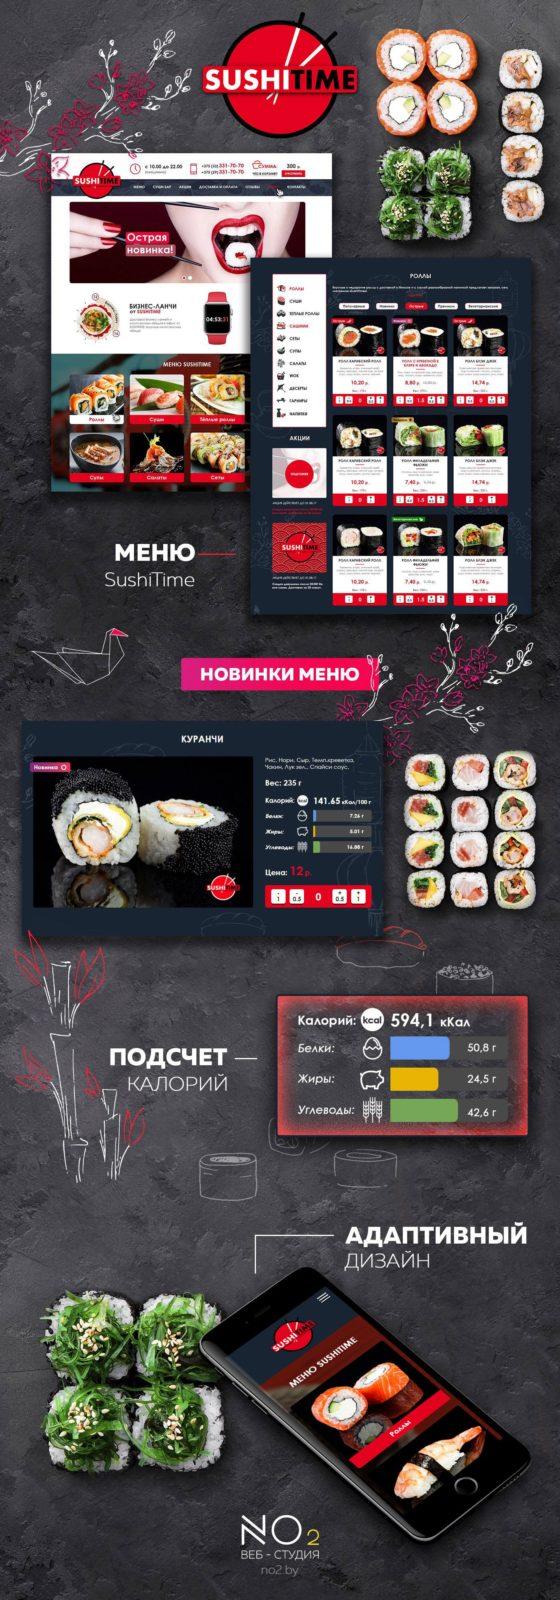 Создание сайта суши «SushiTime.by»